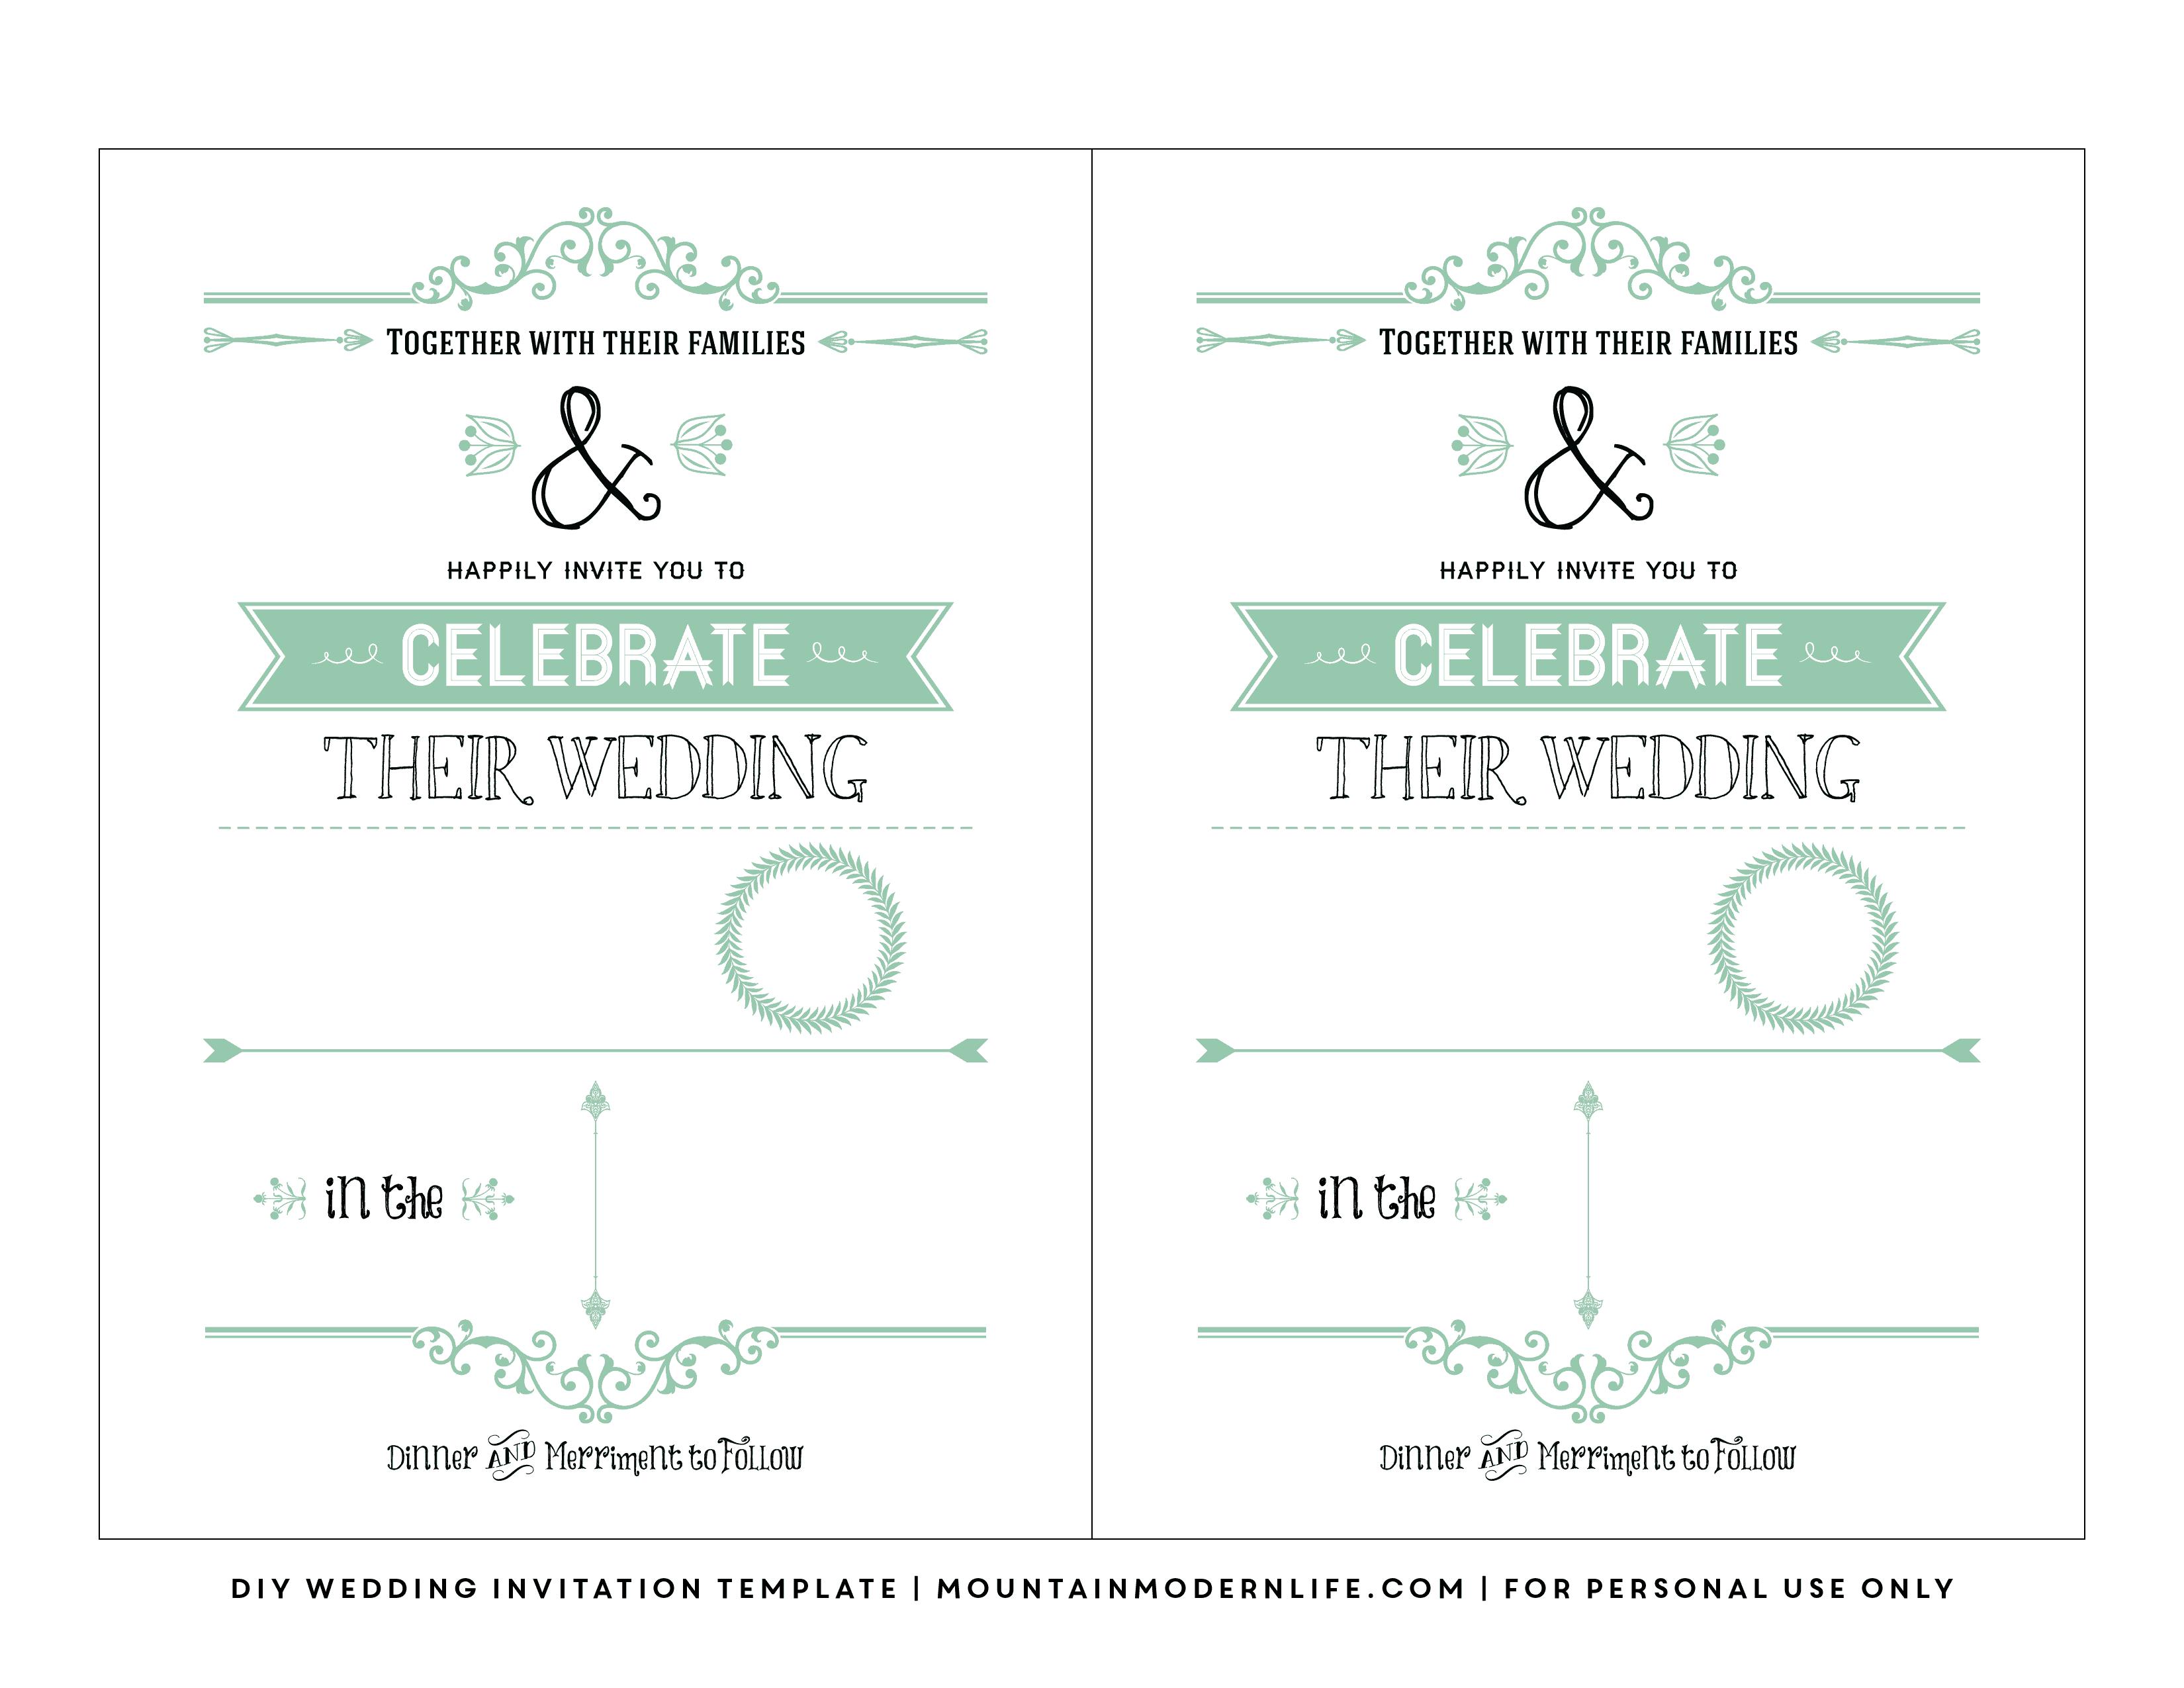 Free Wedding Invitation Template | Mountainmodernlife - Free Printable Postcard Invitations Template